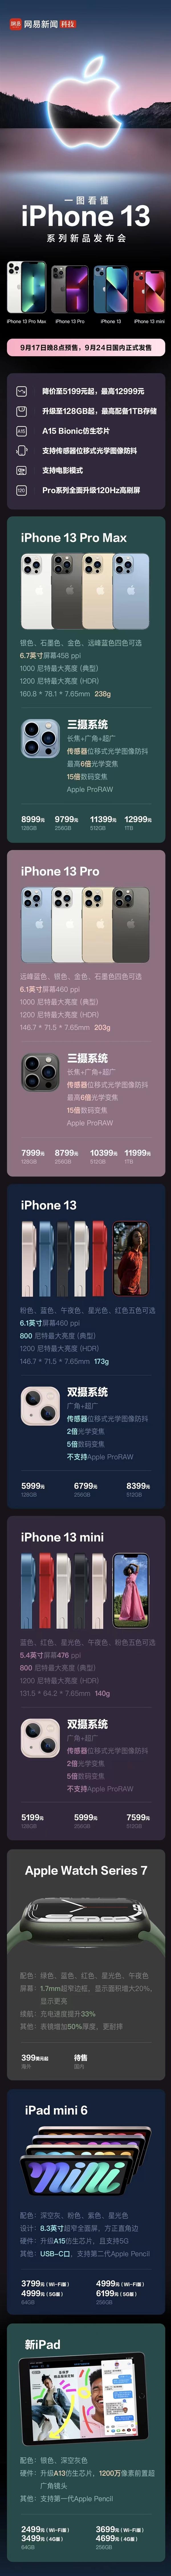 iPhone13起售价为5999元 一图看懂苹果发布会:十三真的香